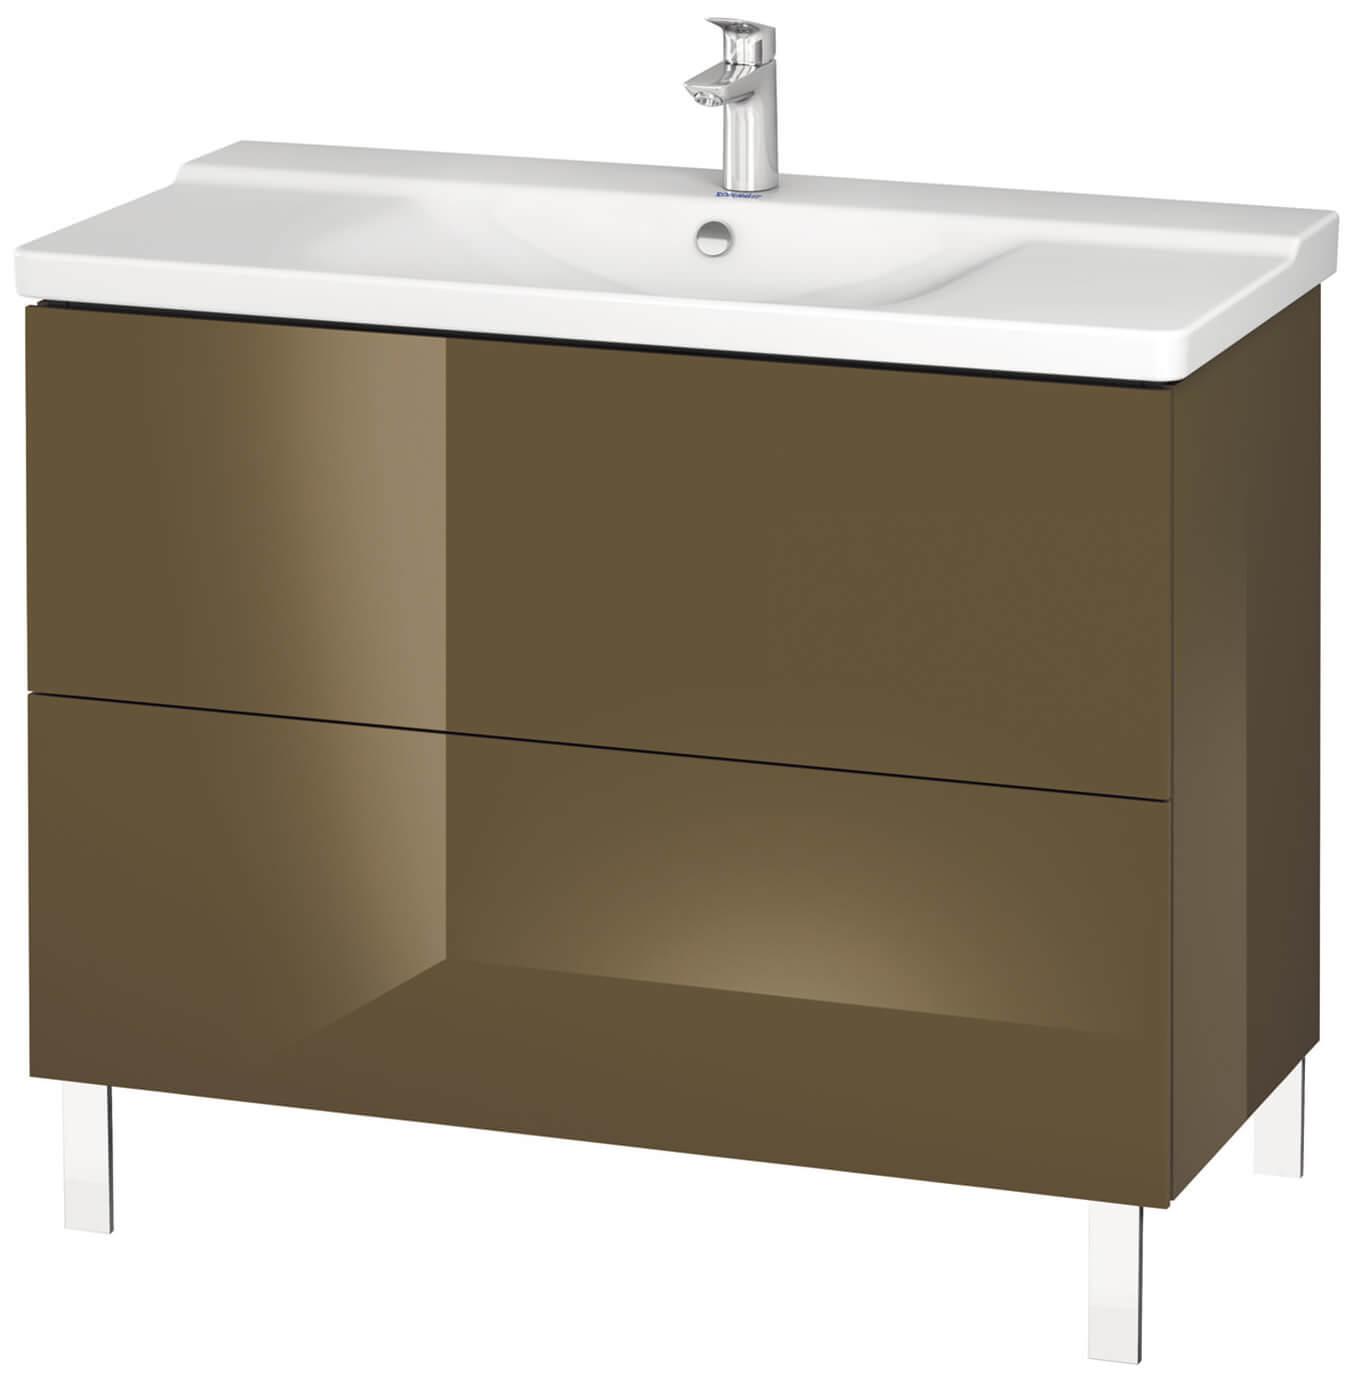 duravit l cube 1020mm floor standing vanity unit. Black Bedroom Furniture Sets. Home Design Ideas